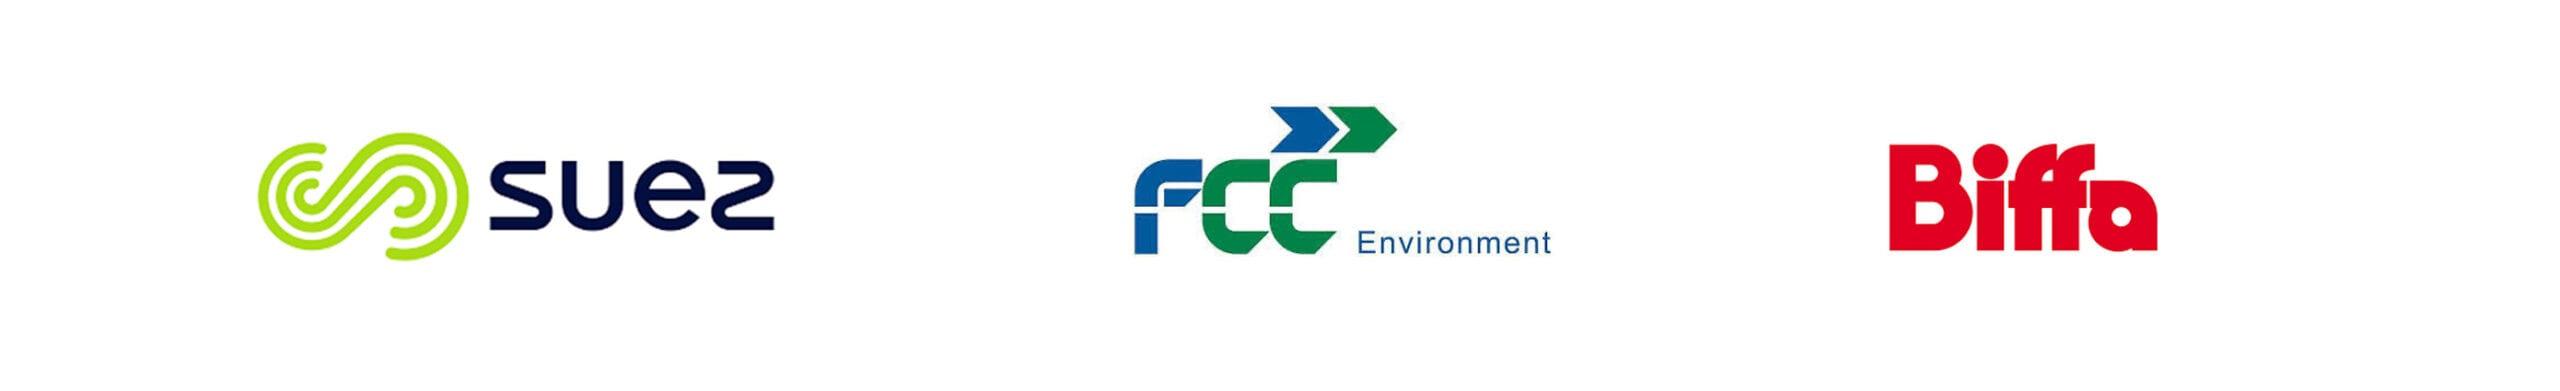 Waste site logos